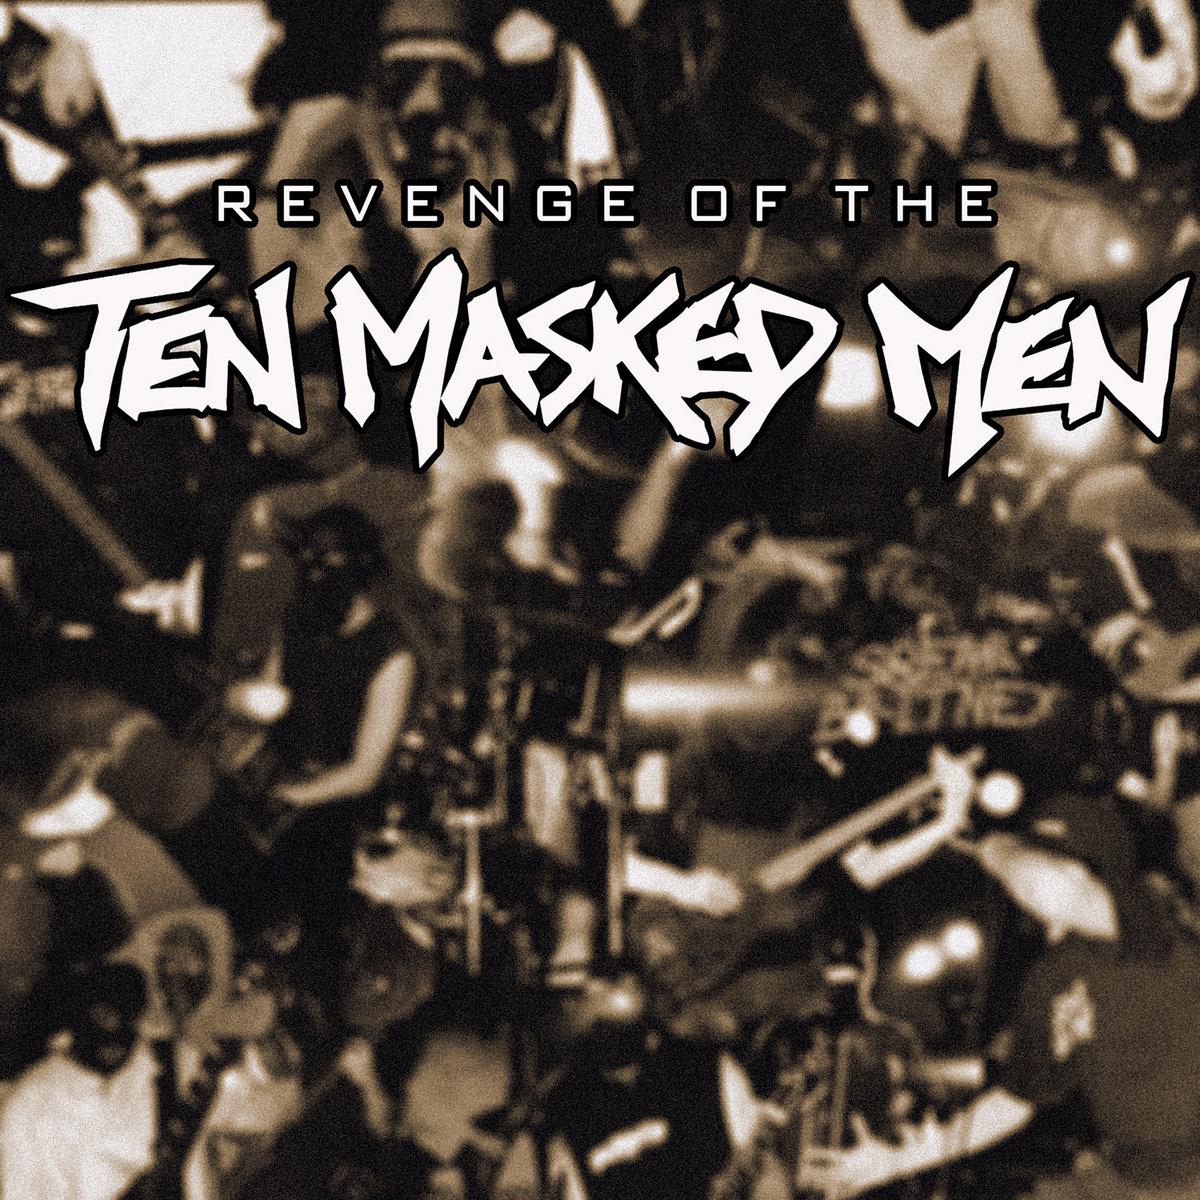 Ten Masked Men Return Of The Ten Masked Men 121